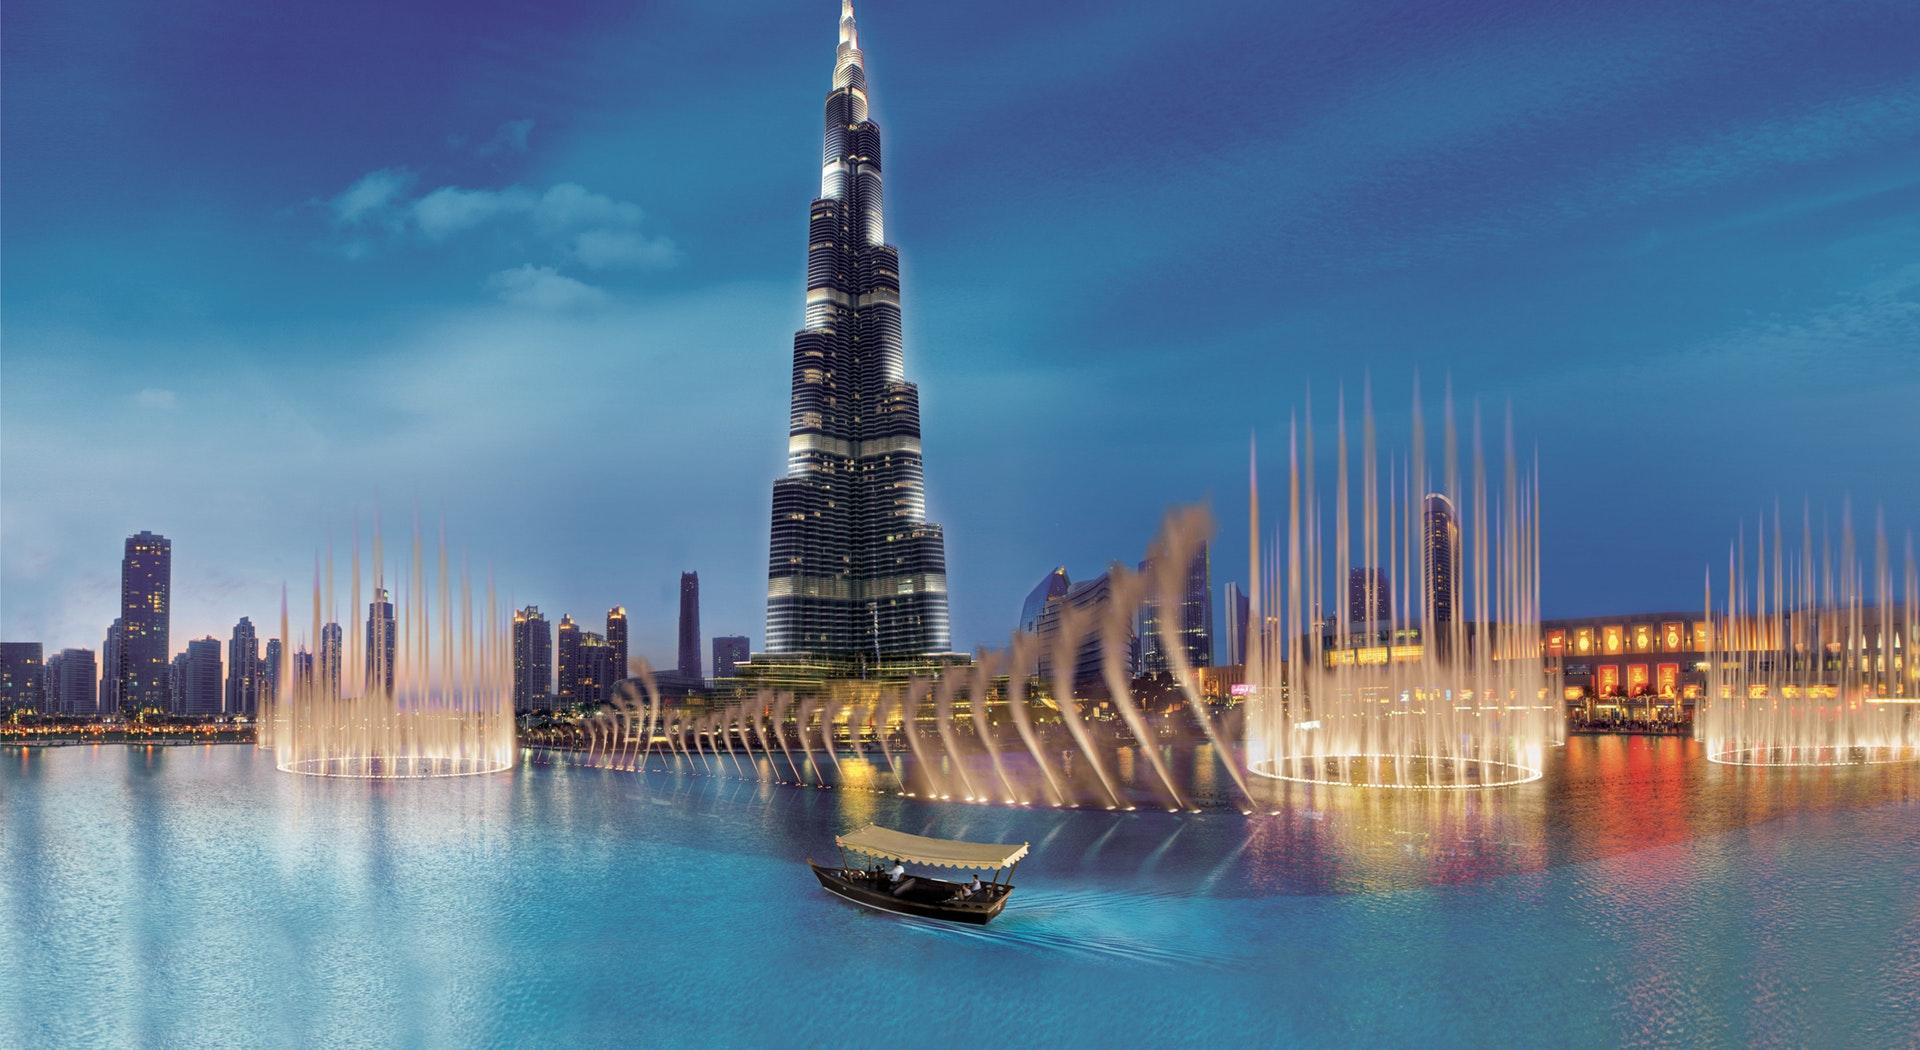 Dubai Fountain - Burj Khalifa Lake